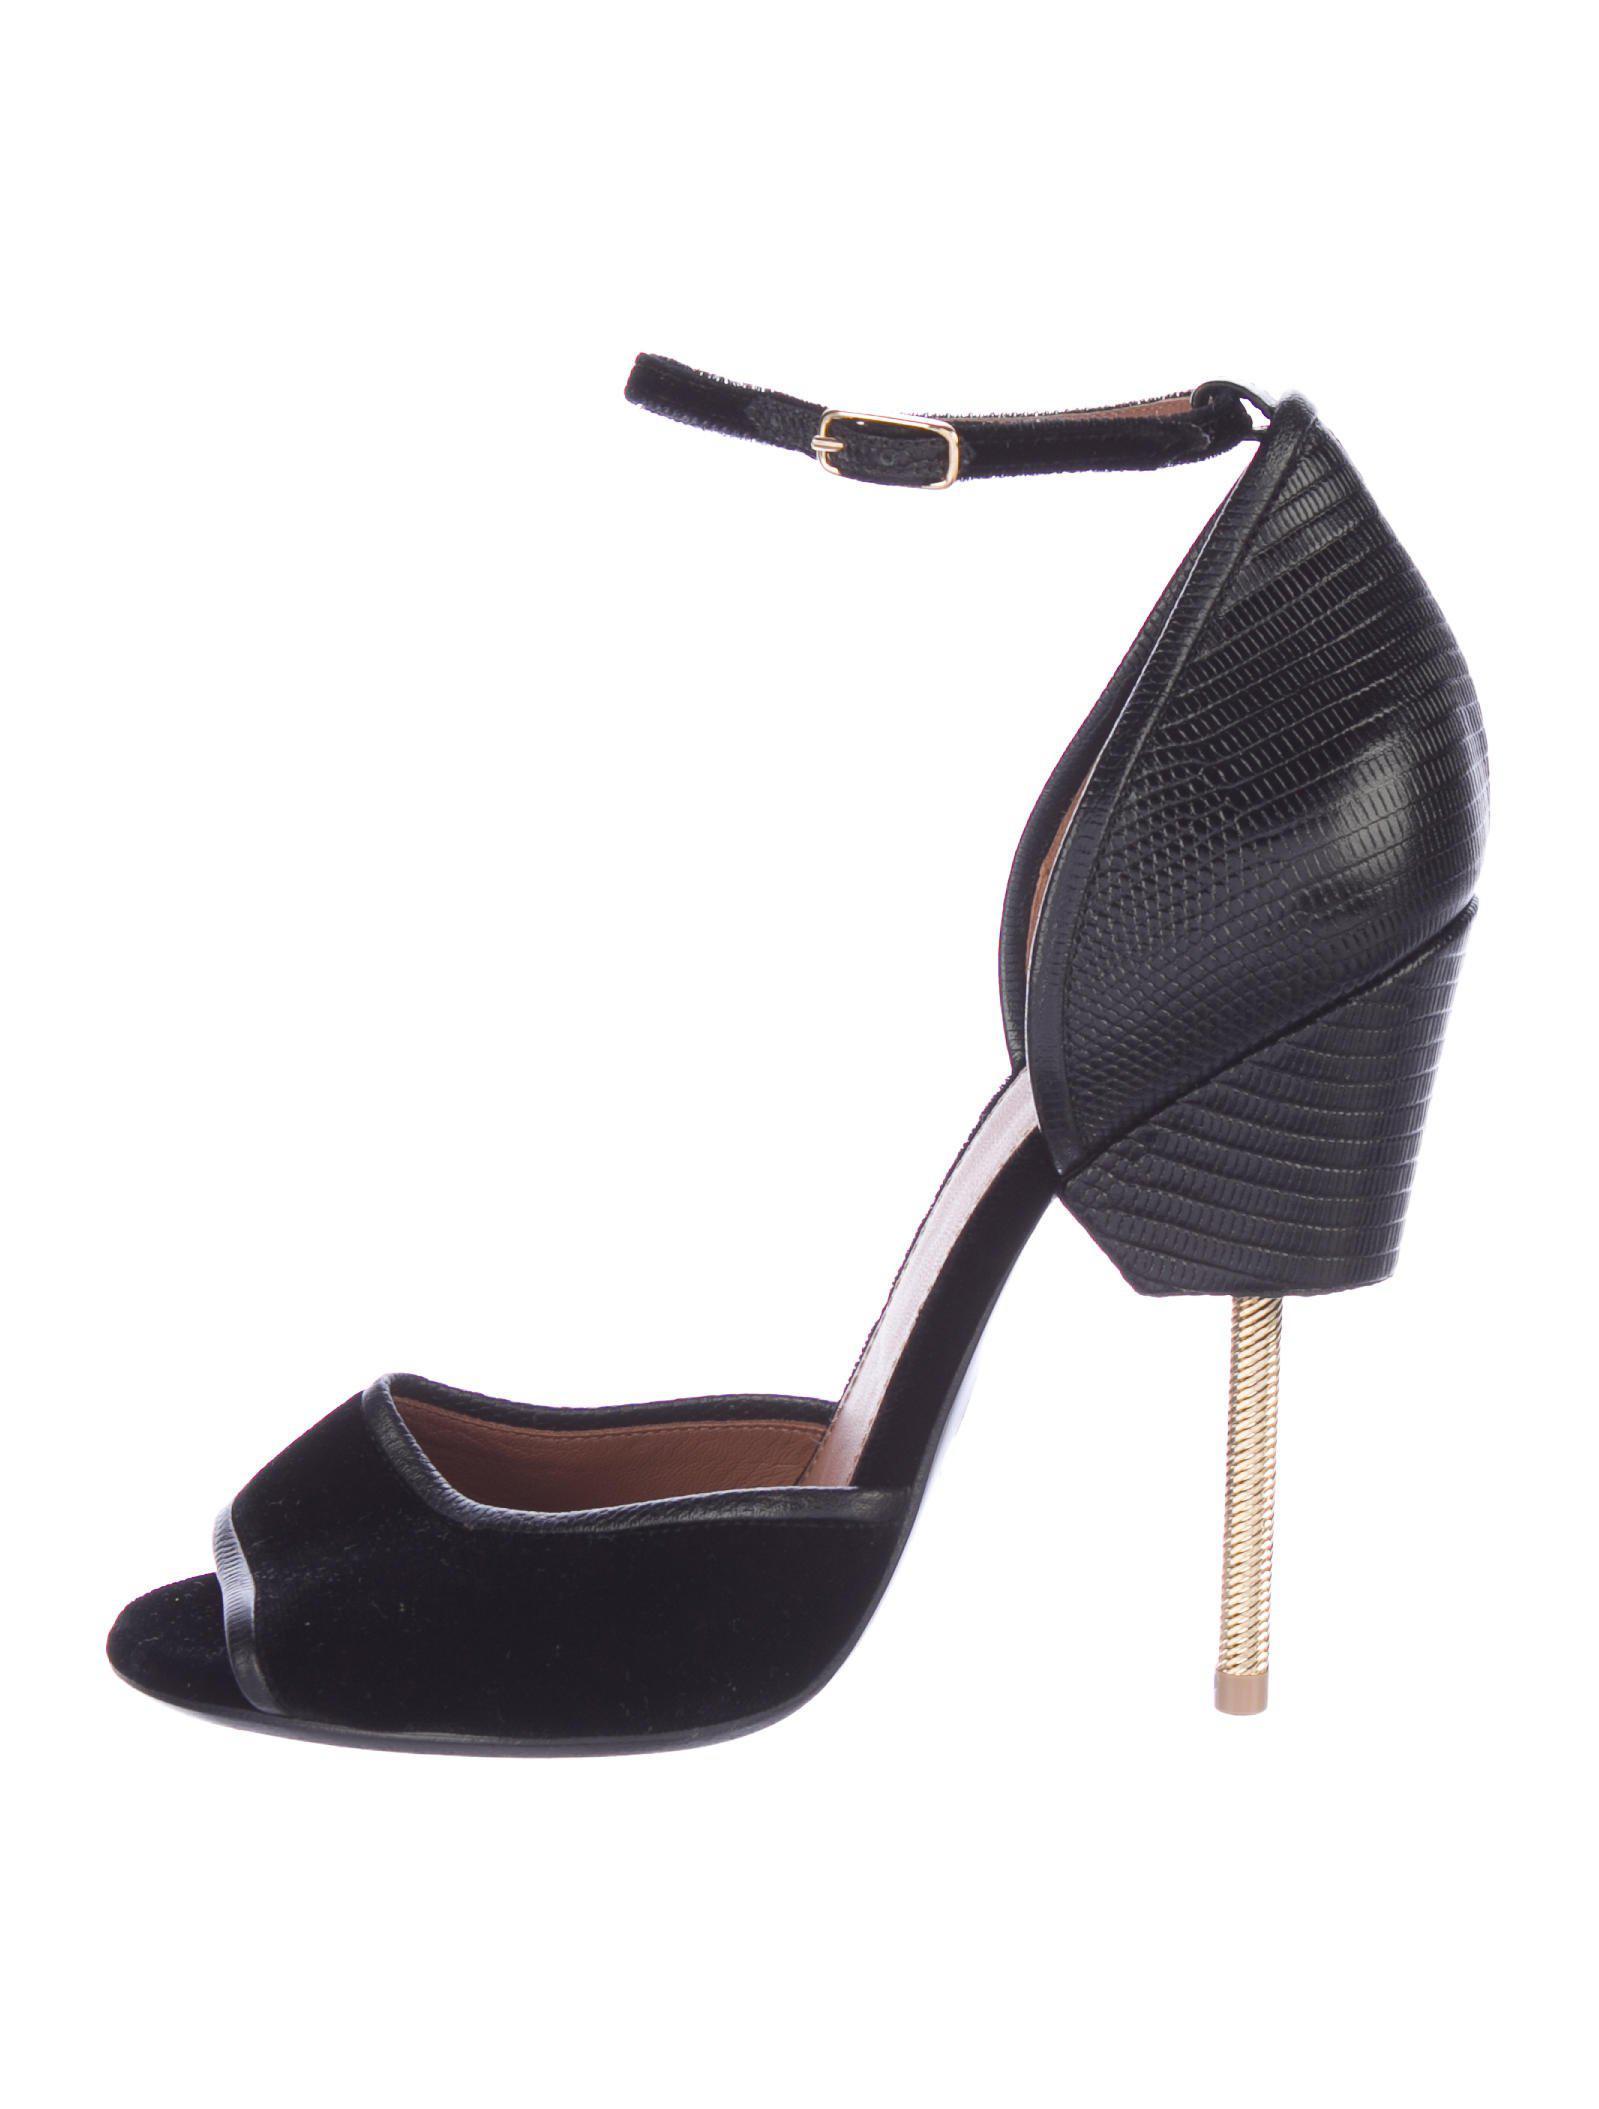 8b26f04376e Lyst - Givenchy Matilda Lizard-trimmed Sandals Black in Metallic